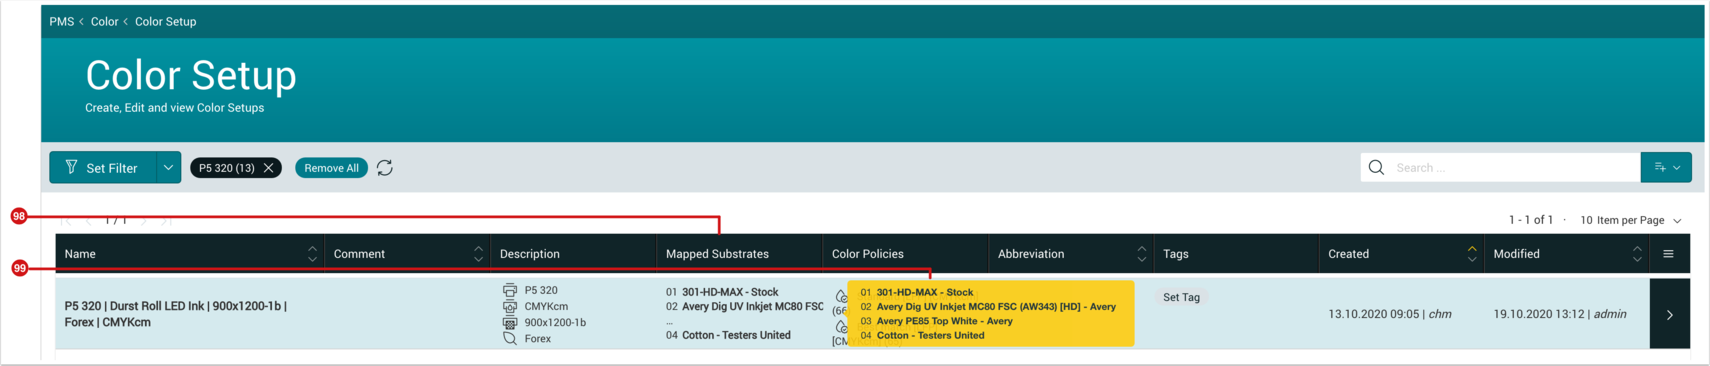 PMS WebGui :: Color Setup